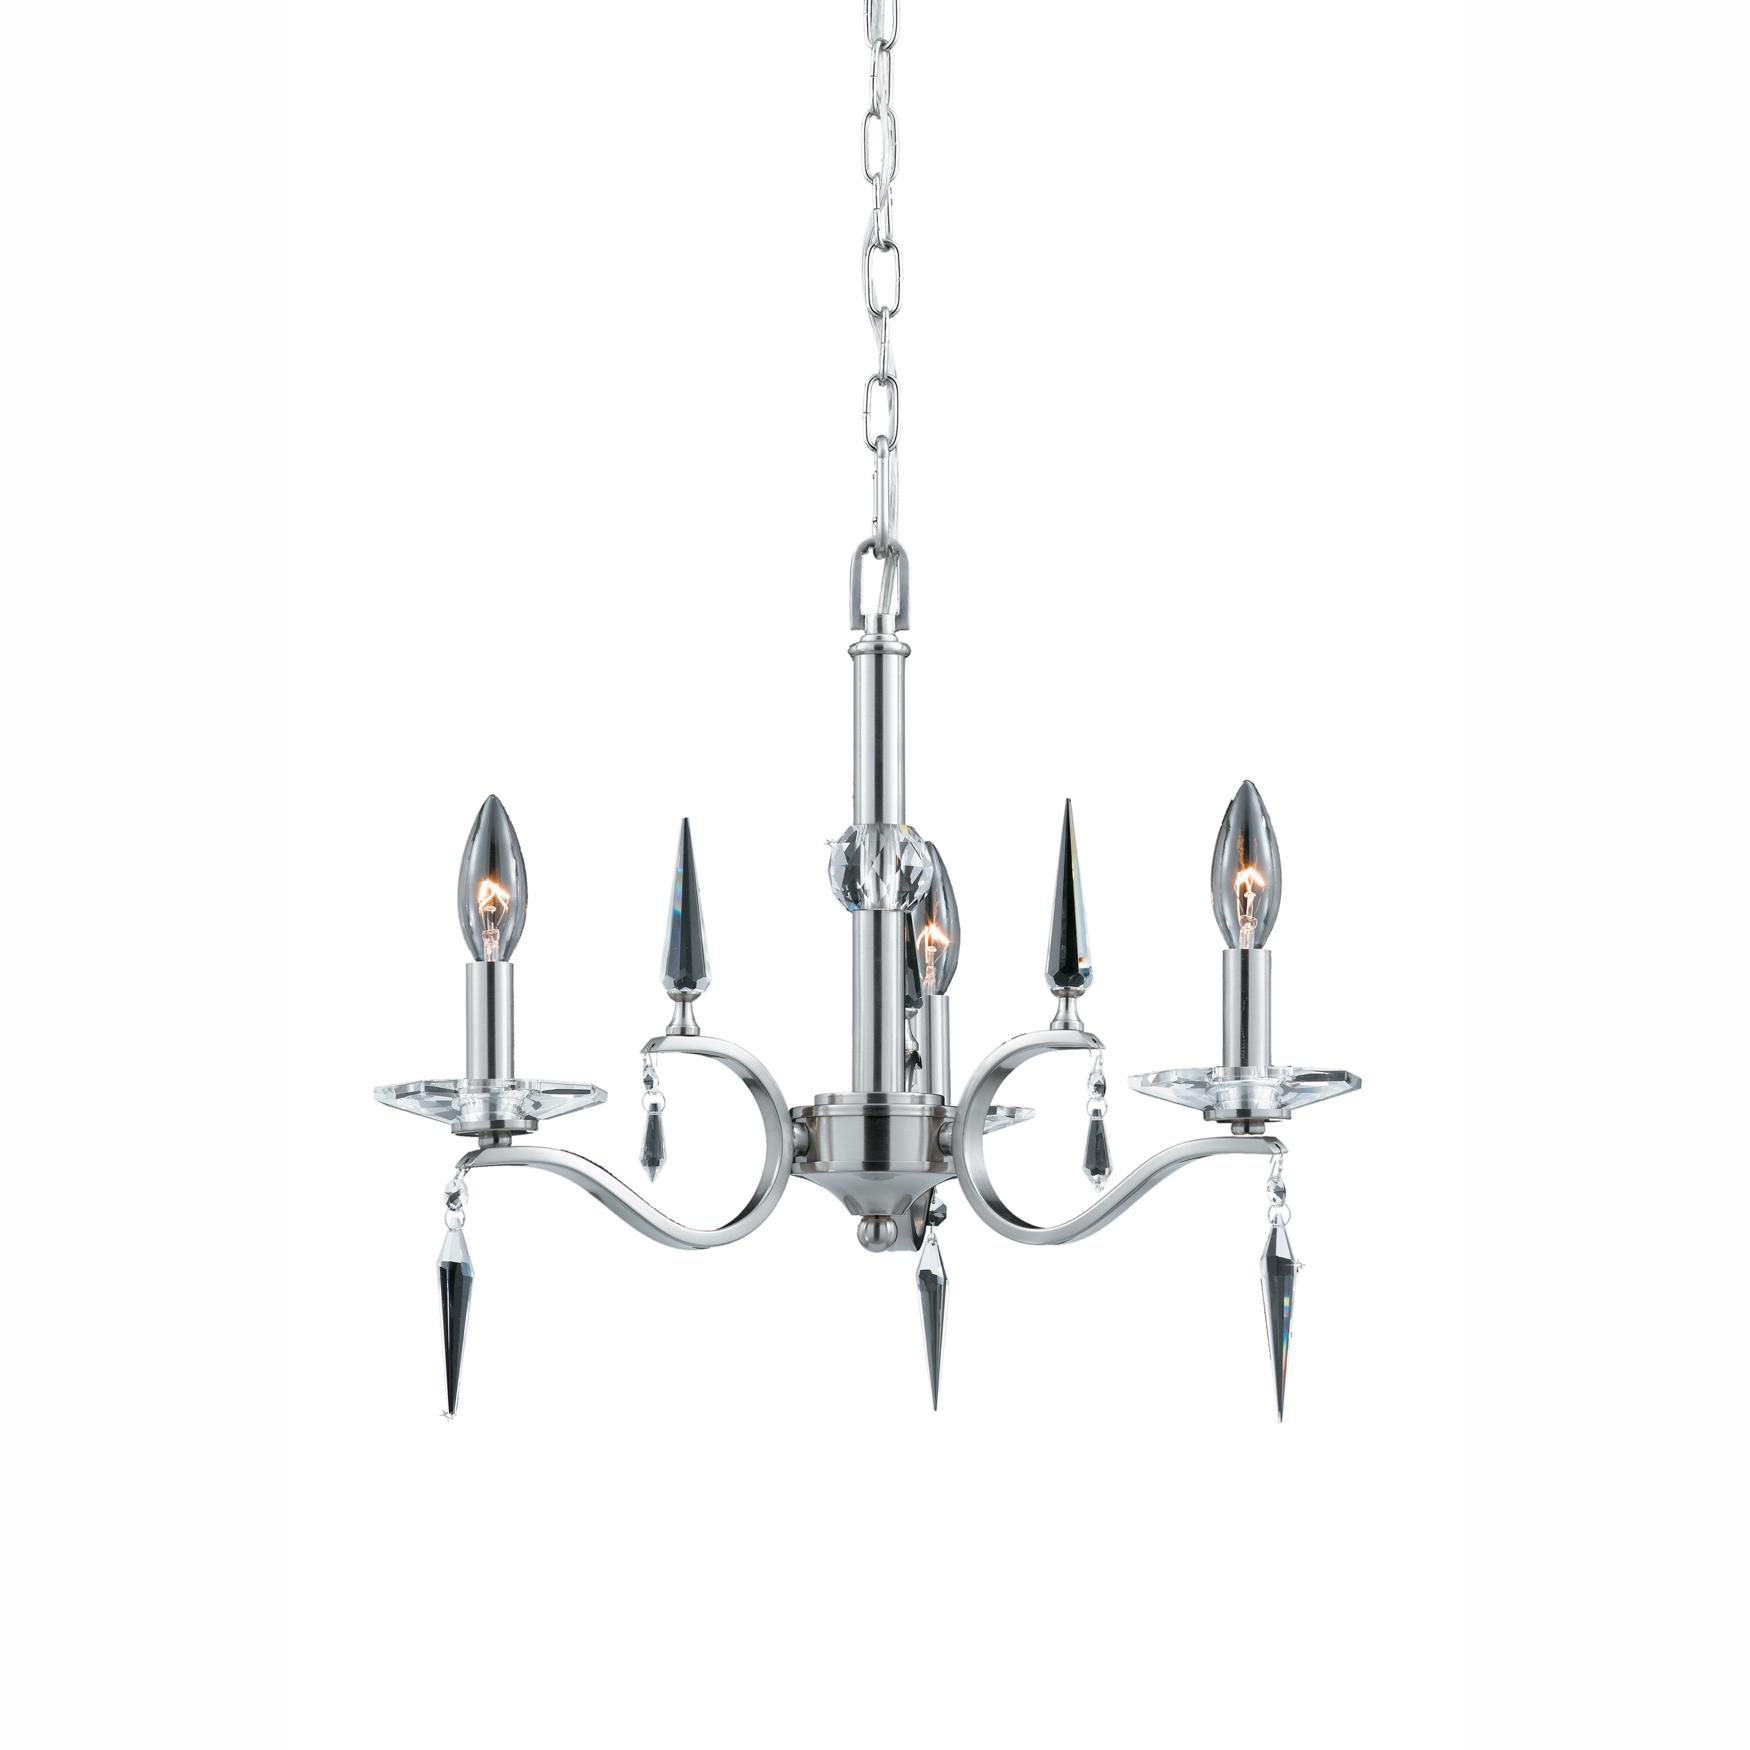 Lumenno Int Silhouette Collection 3 Light Mini Chandelier